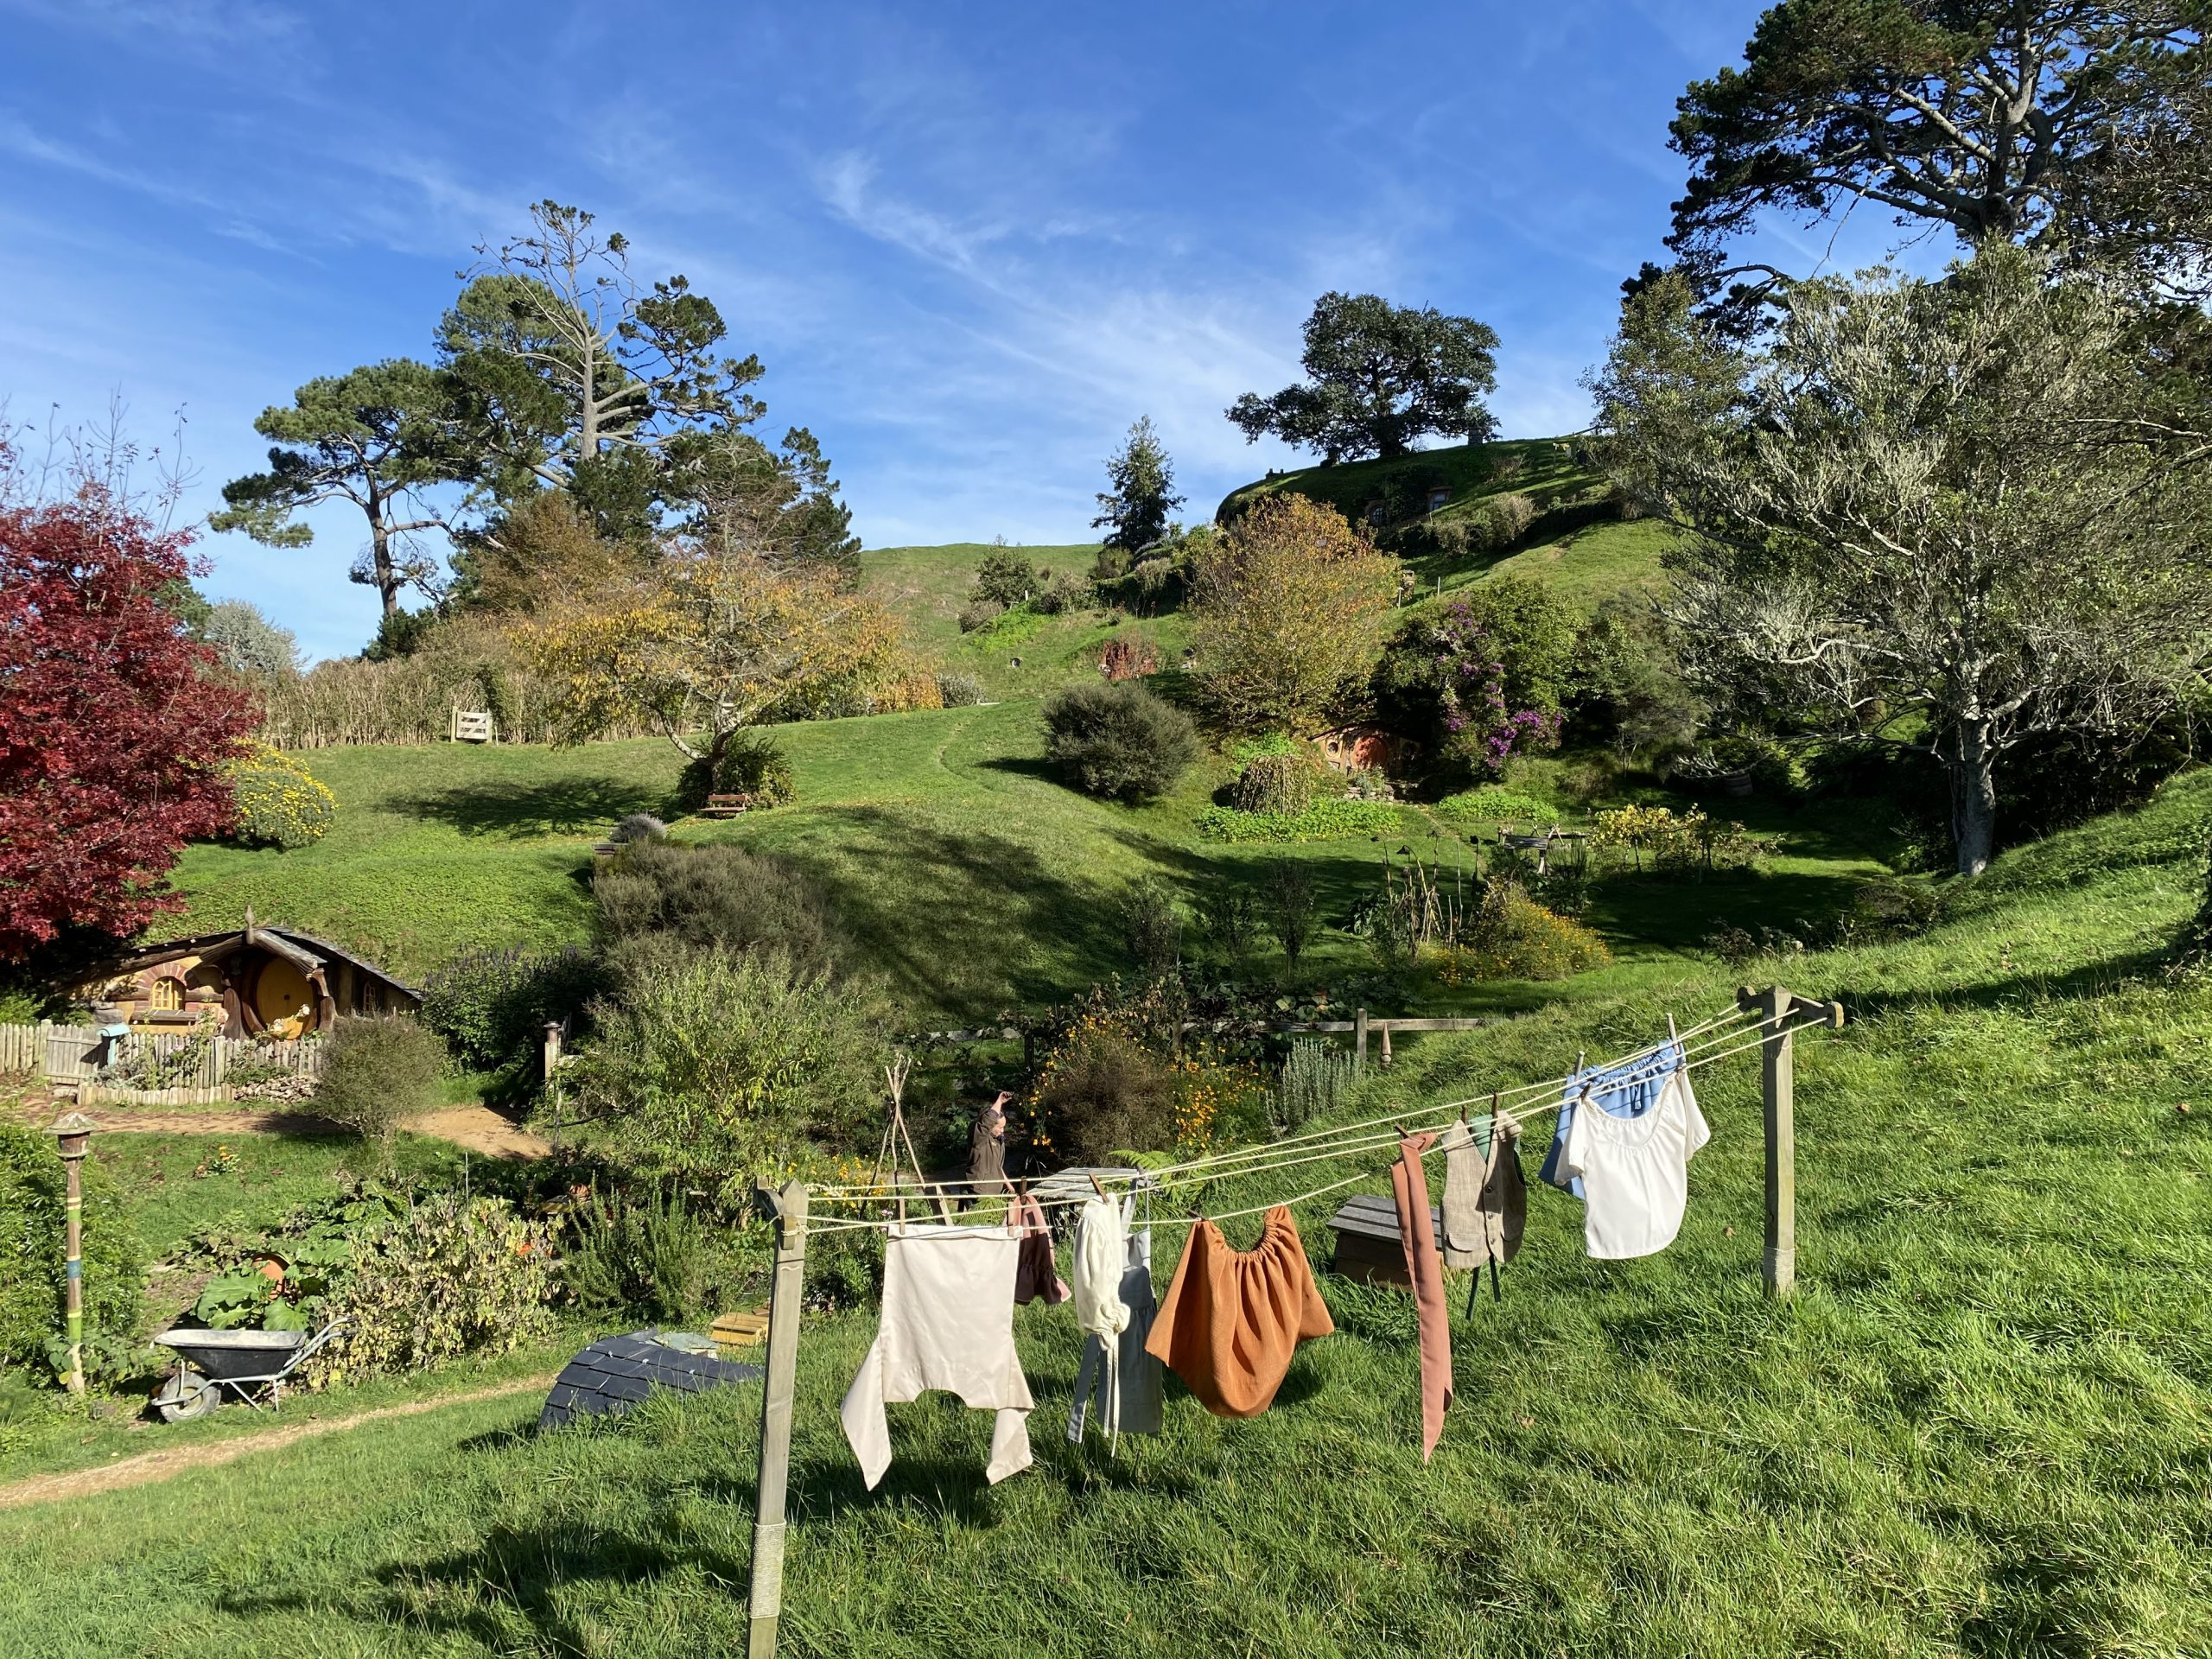 Hobbit Clothes Hanging on the Washing Line at Hobbiton Movie Set